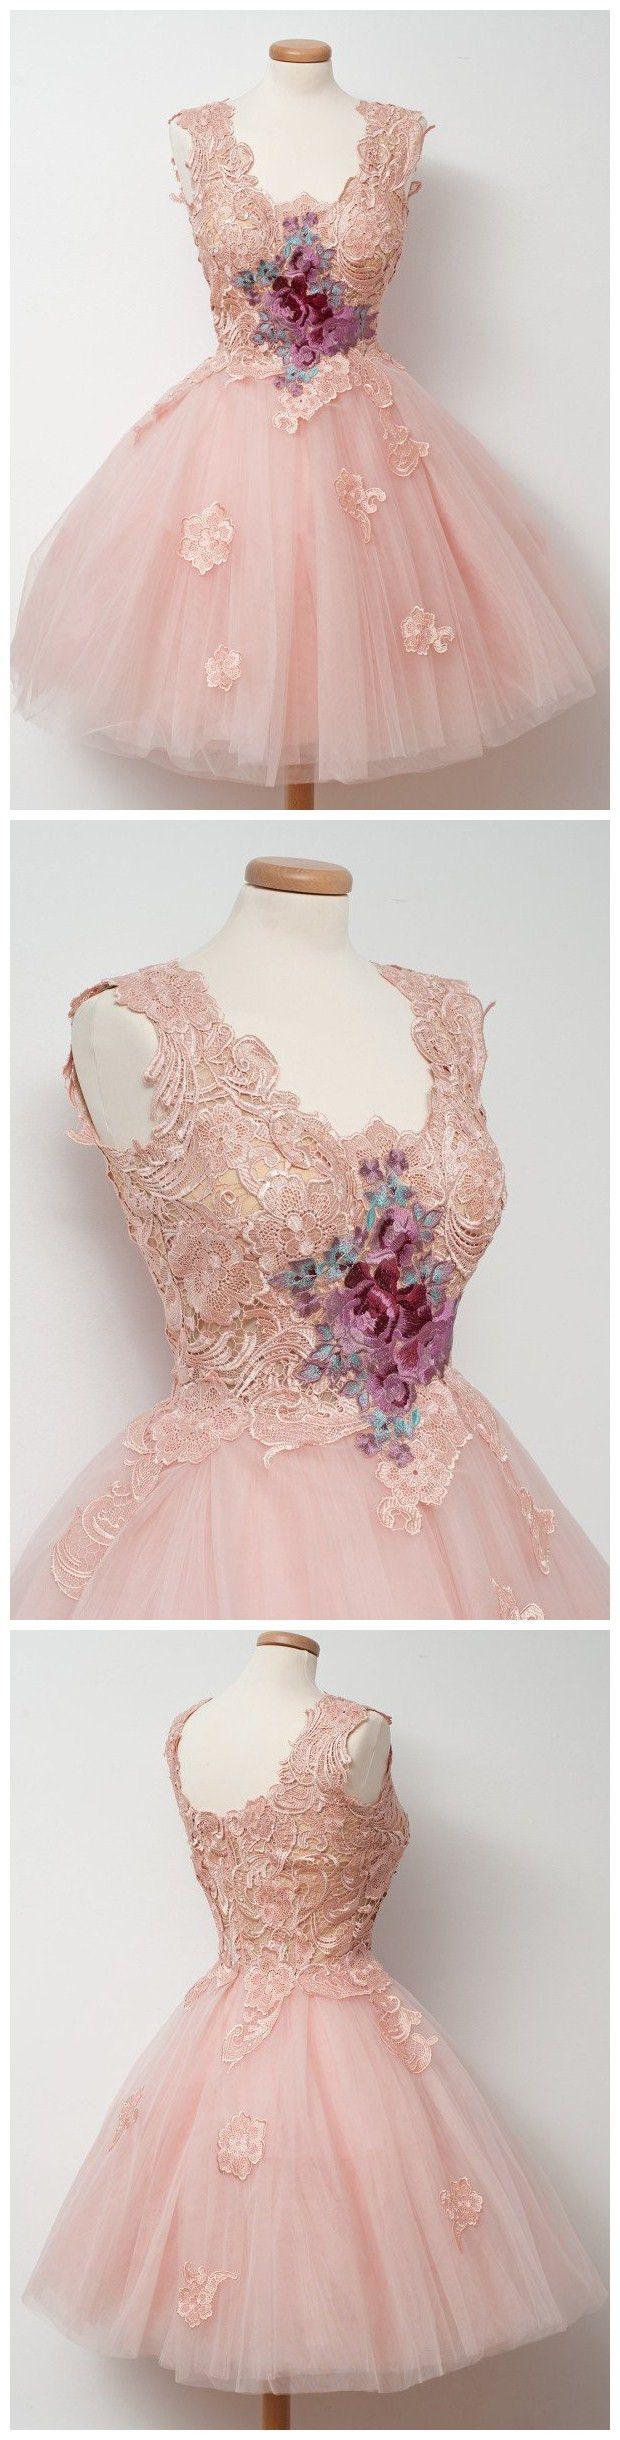 aline scoop short tulle prom drsess homecoming dress kmy